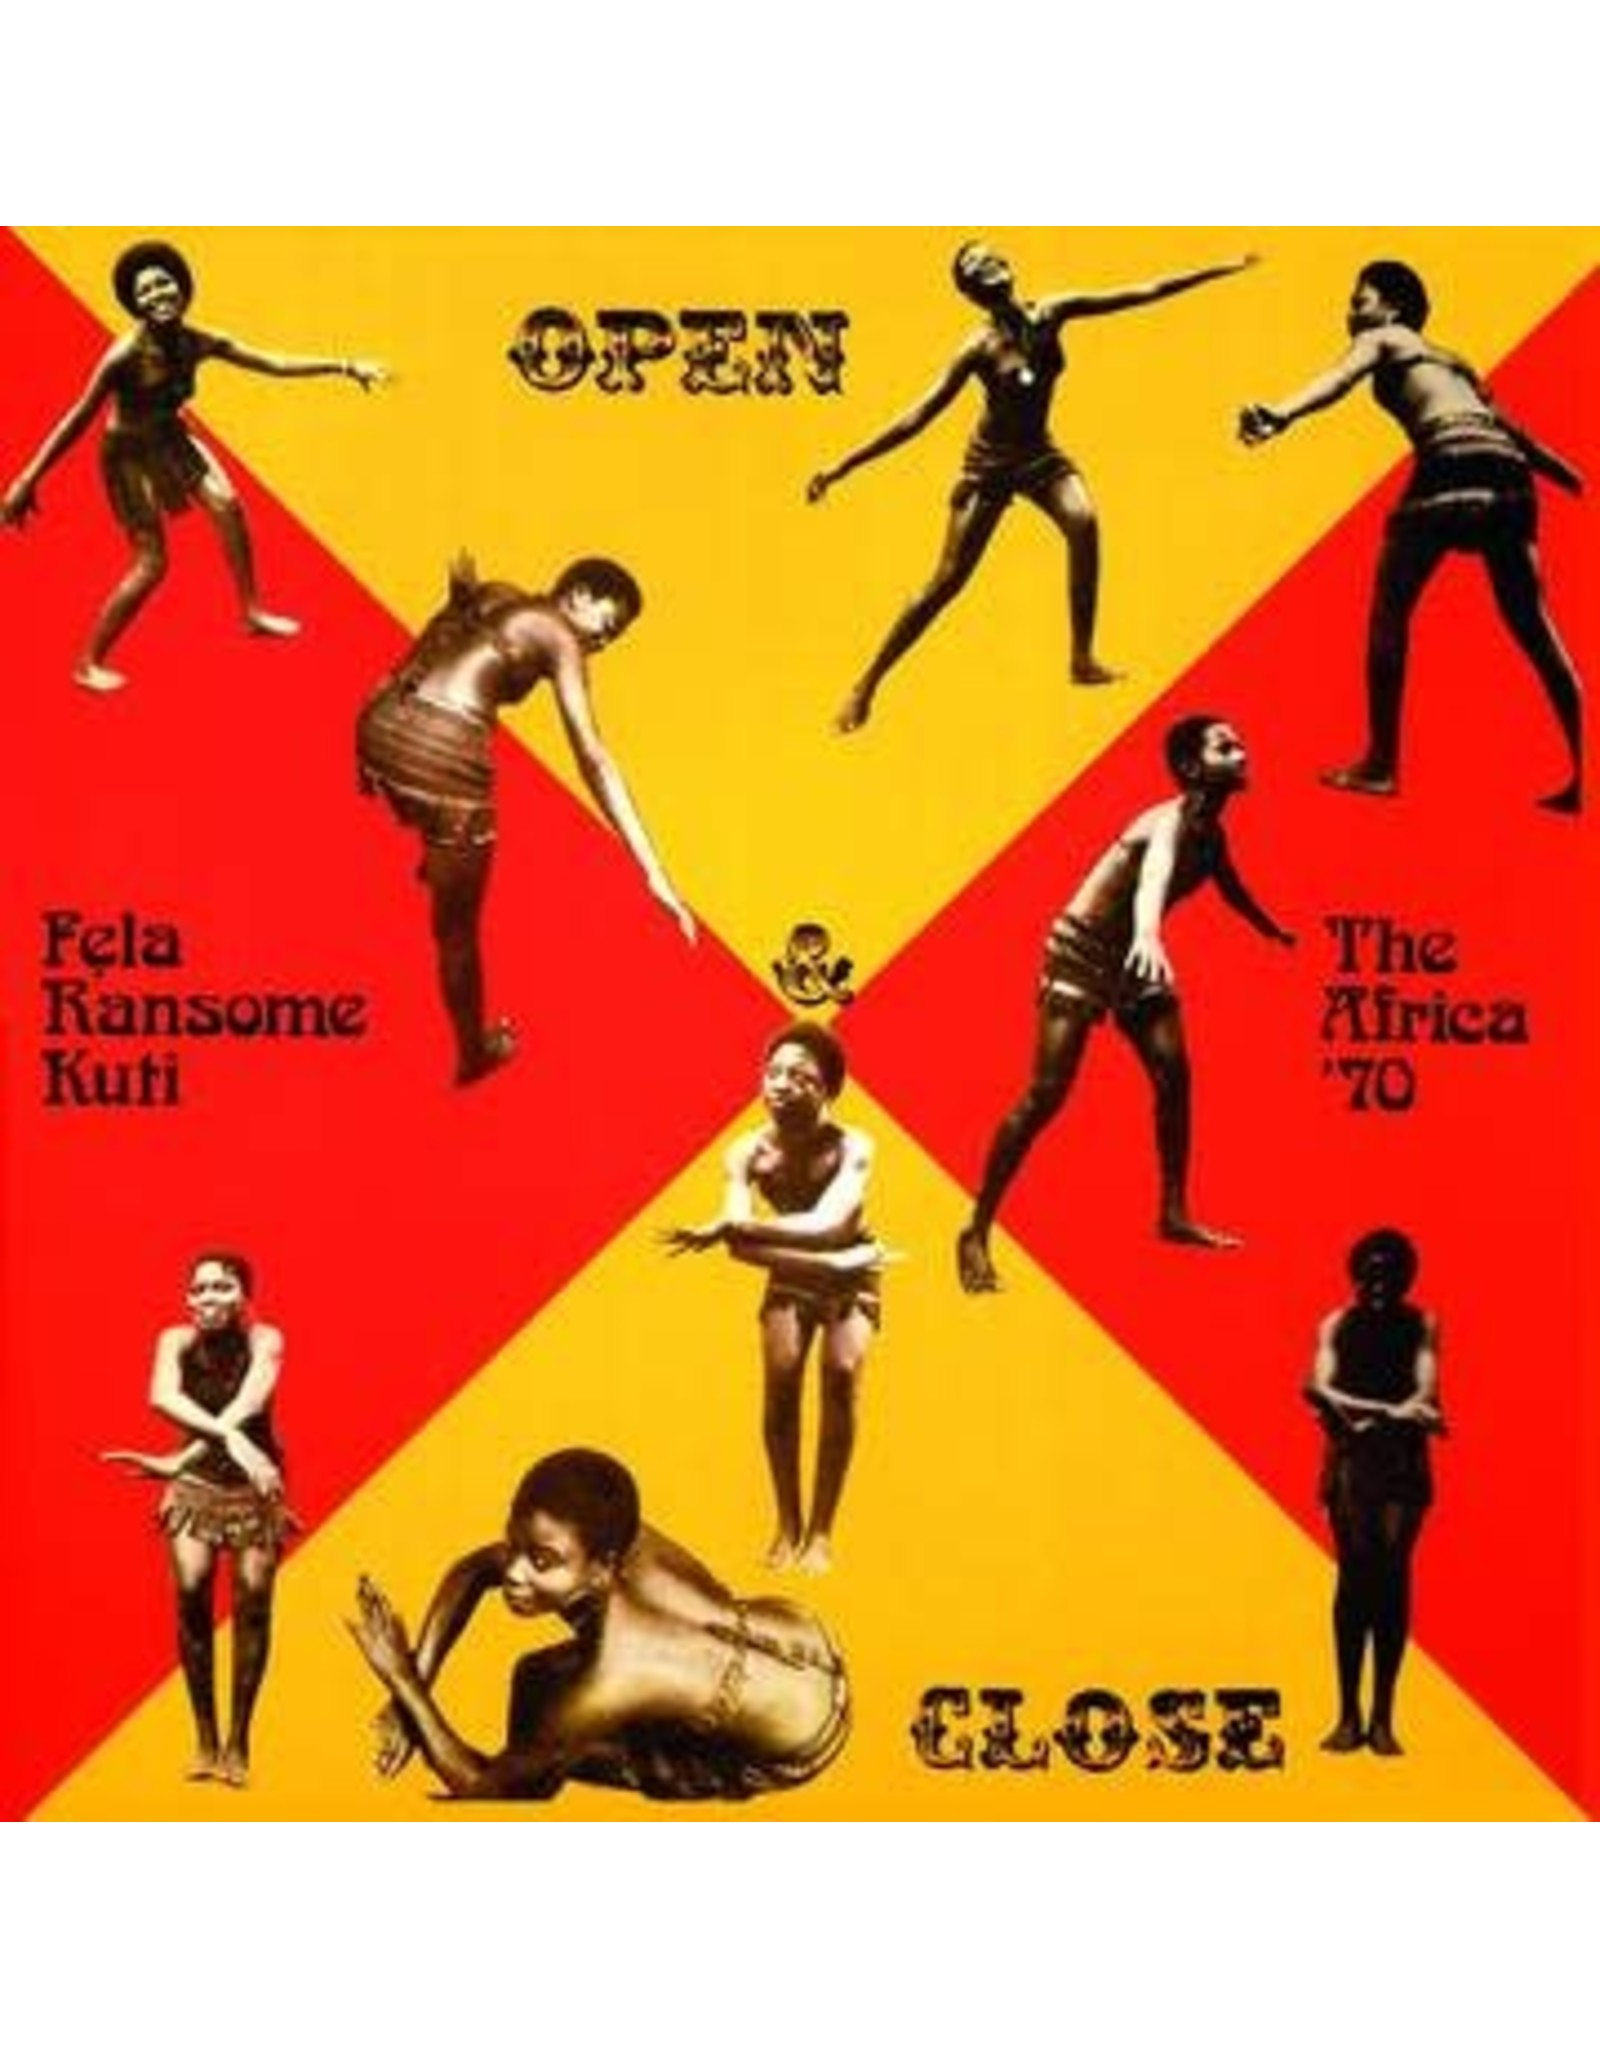 Knitting  Factory Kuti, Fela: Open & Close LP